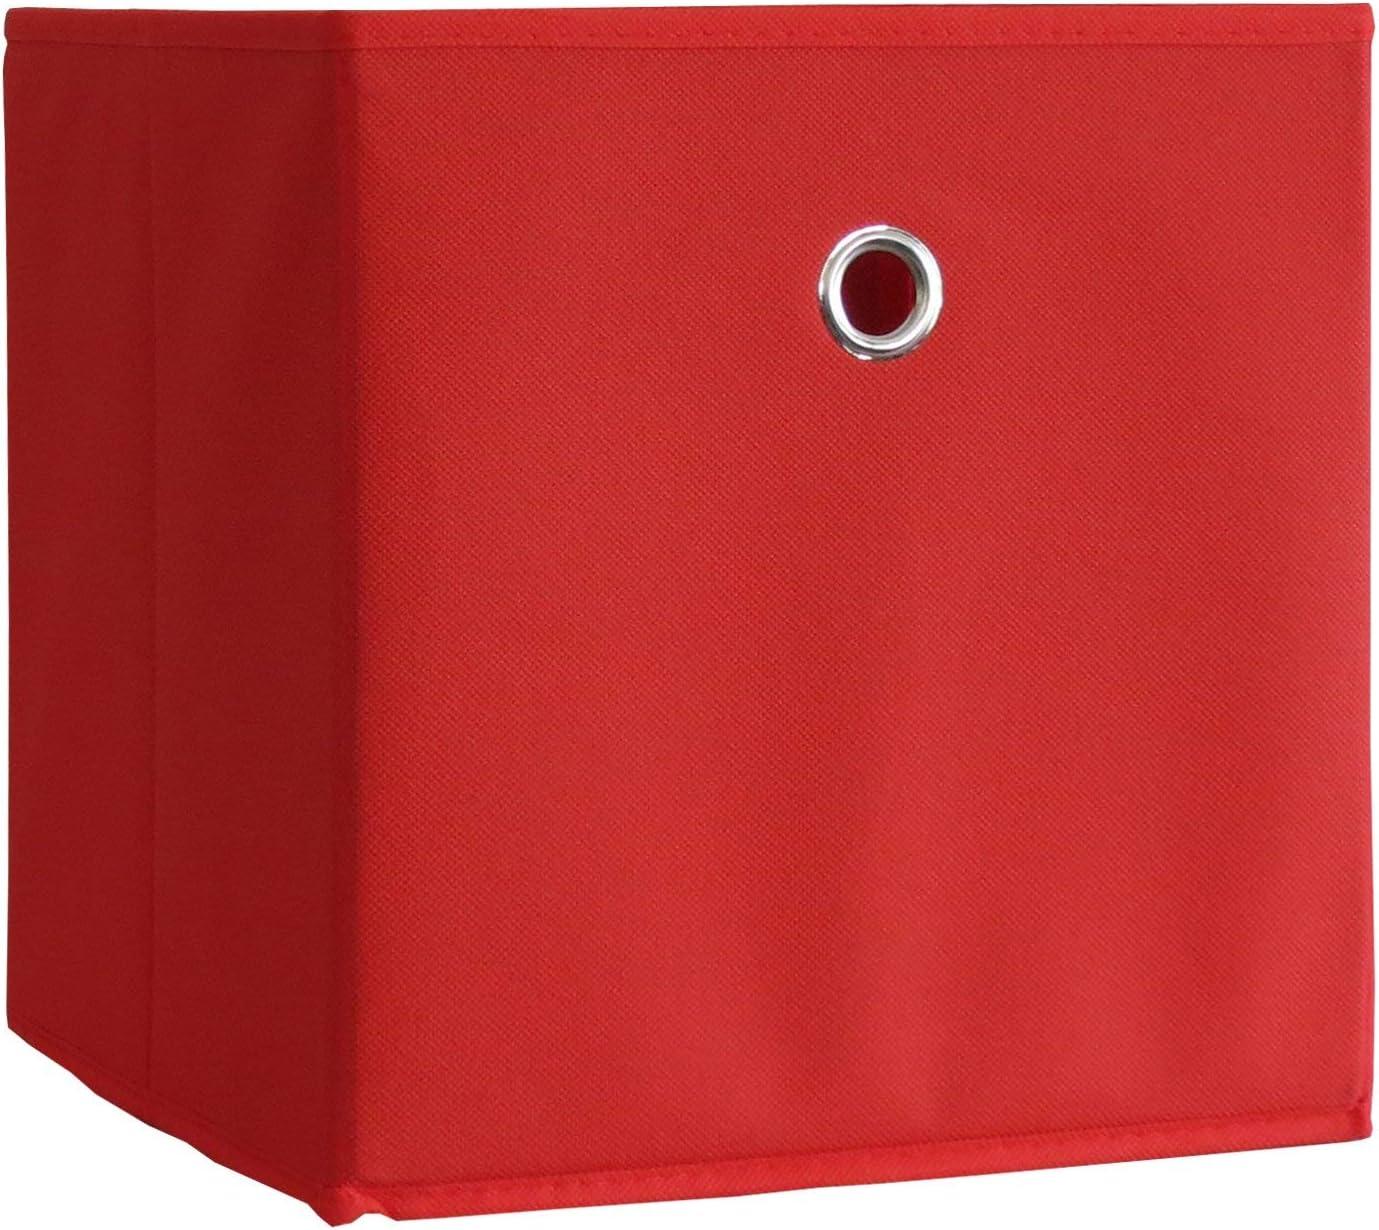 VCM 2er Set Faltbox Klappbox Sammelbox Stoffbox Regalbox Regalkorb Korb ohne Deckel 28 x 27 x 27 cm Orange Boxas